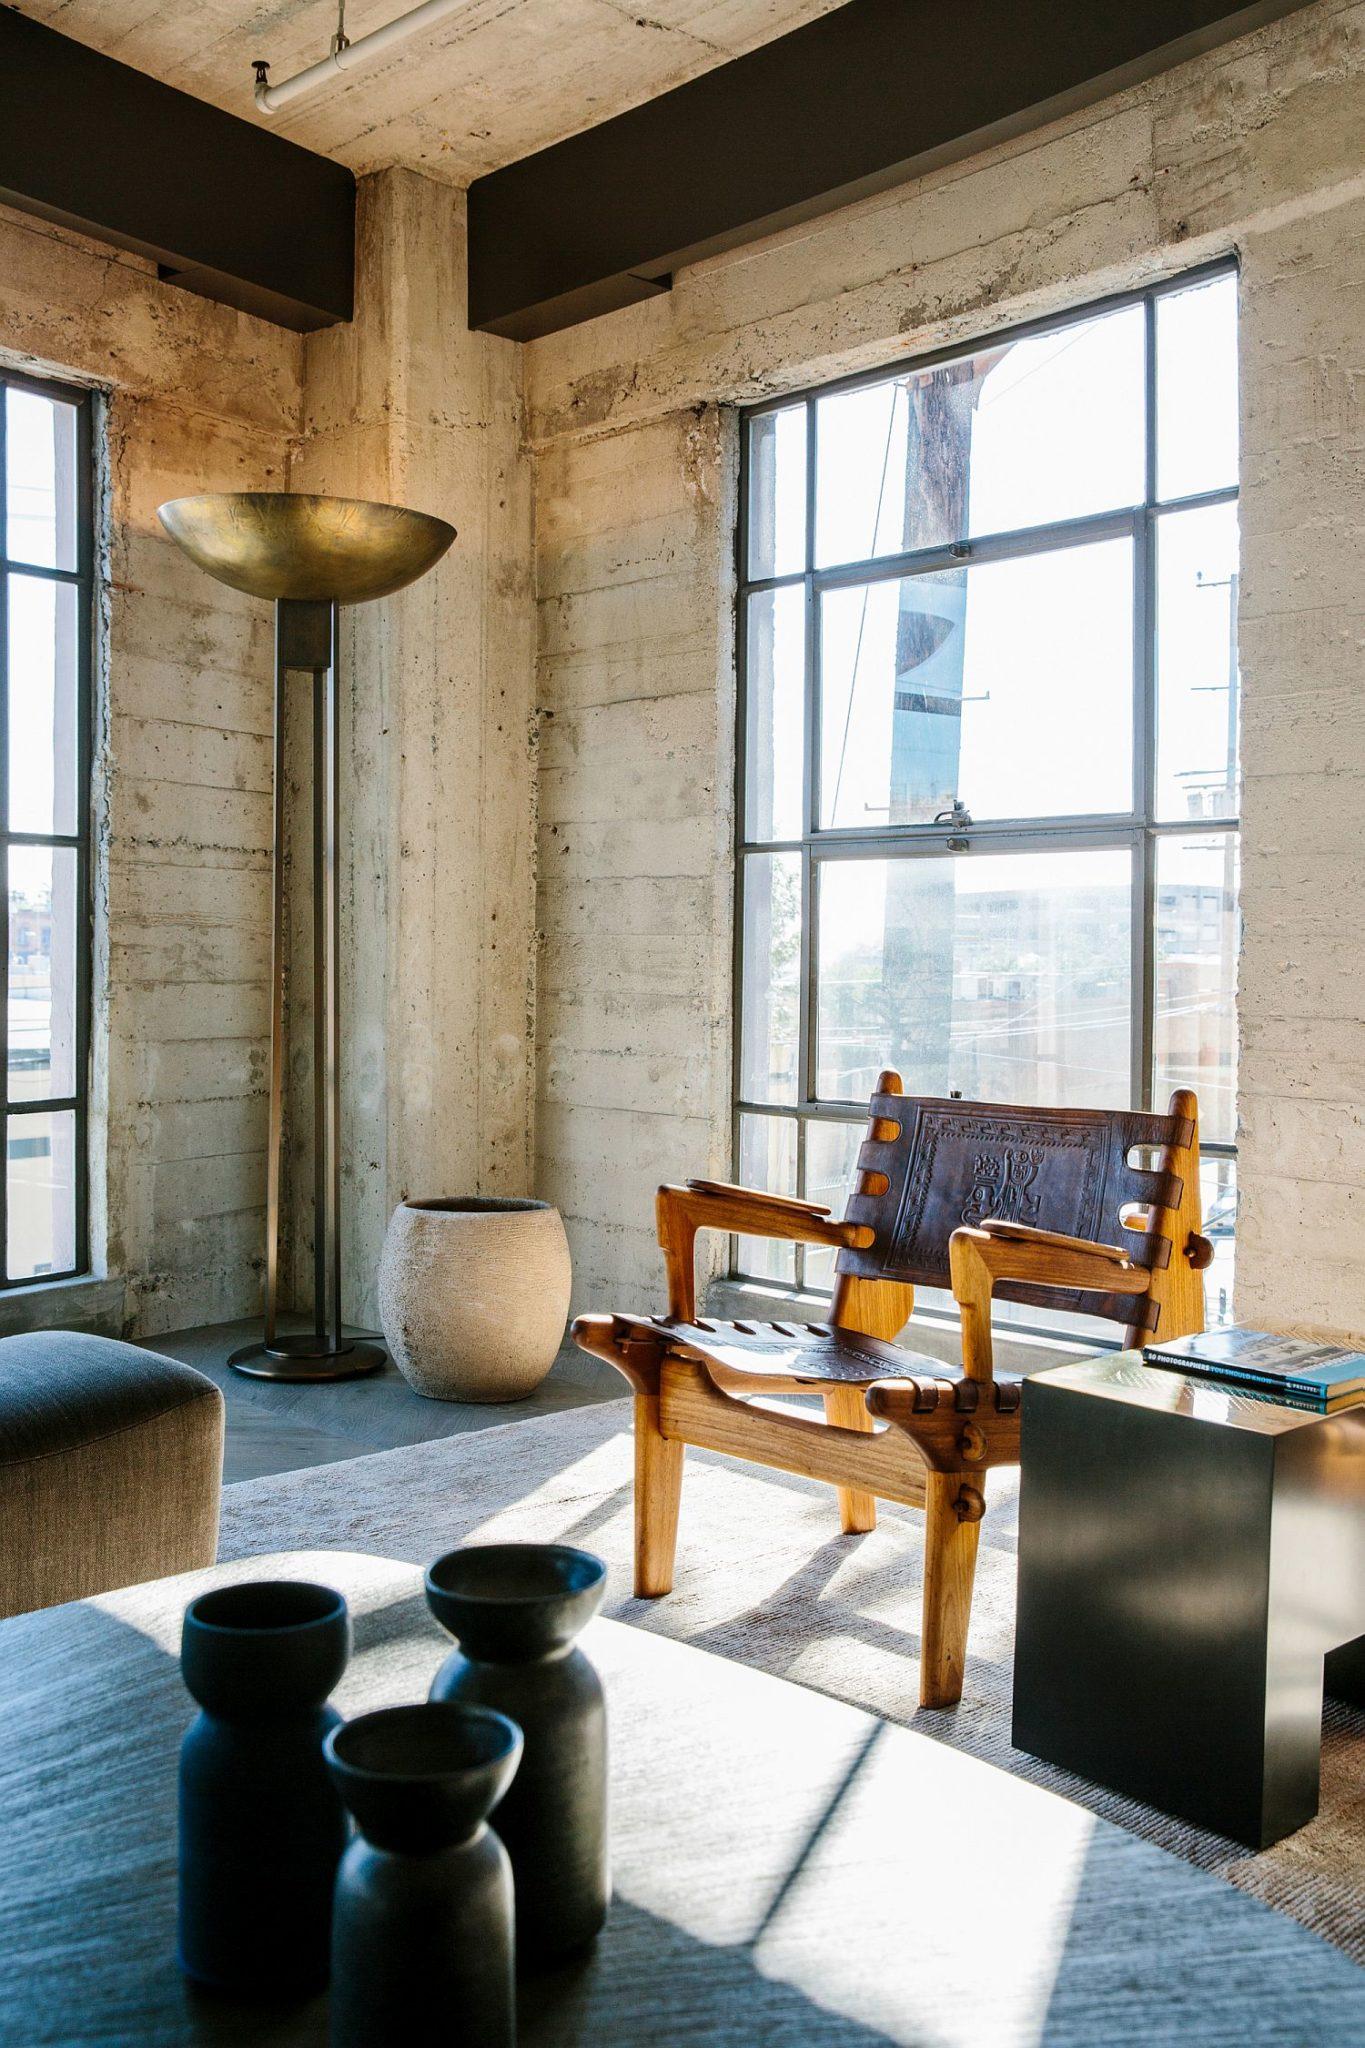 1920s Warehouse in Los Angeles Turned into a Splendid Modern Industrial Loft